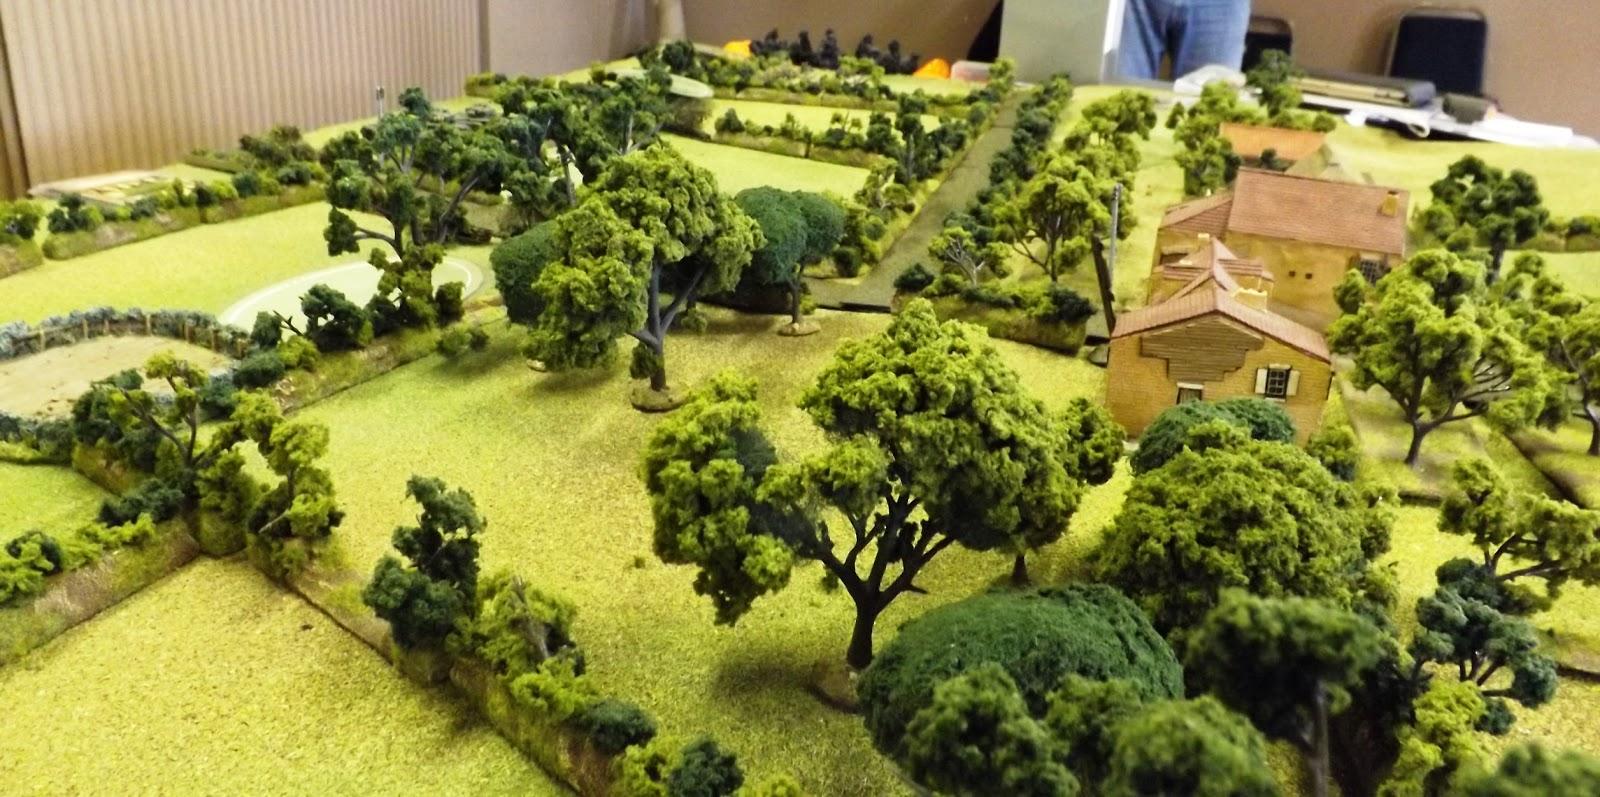 Close Normandy terrain providing plenty of cover for friend and foe alike